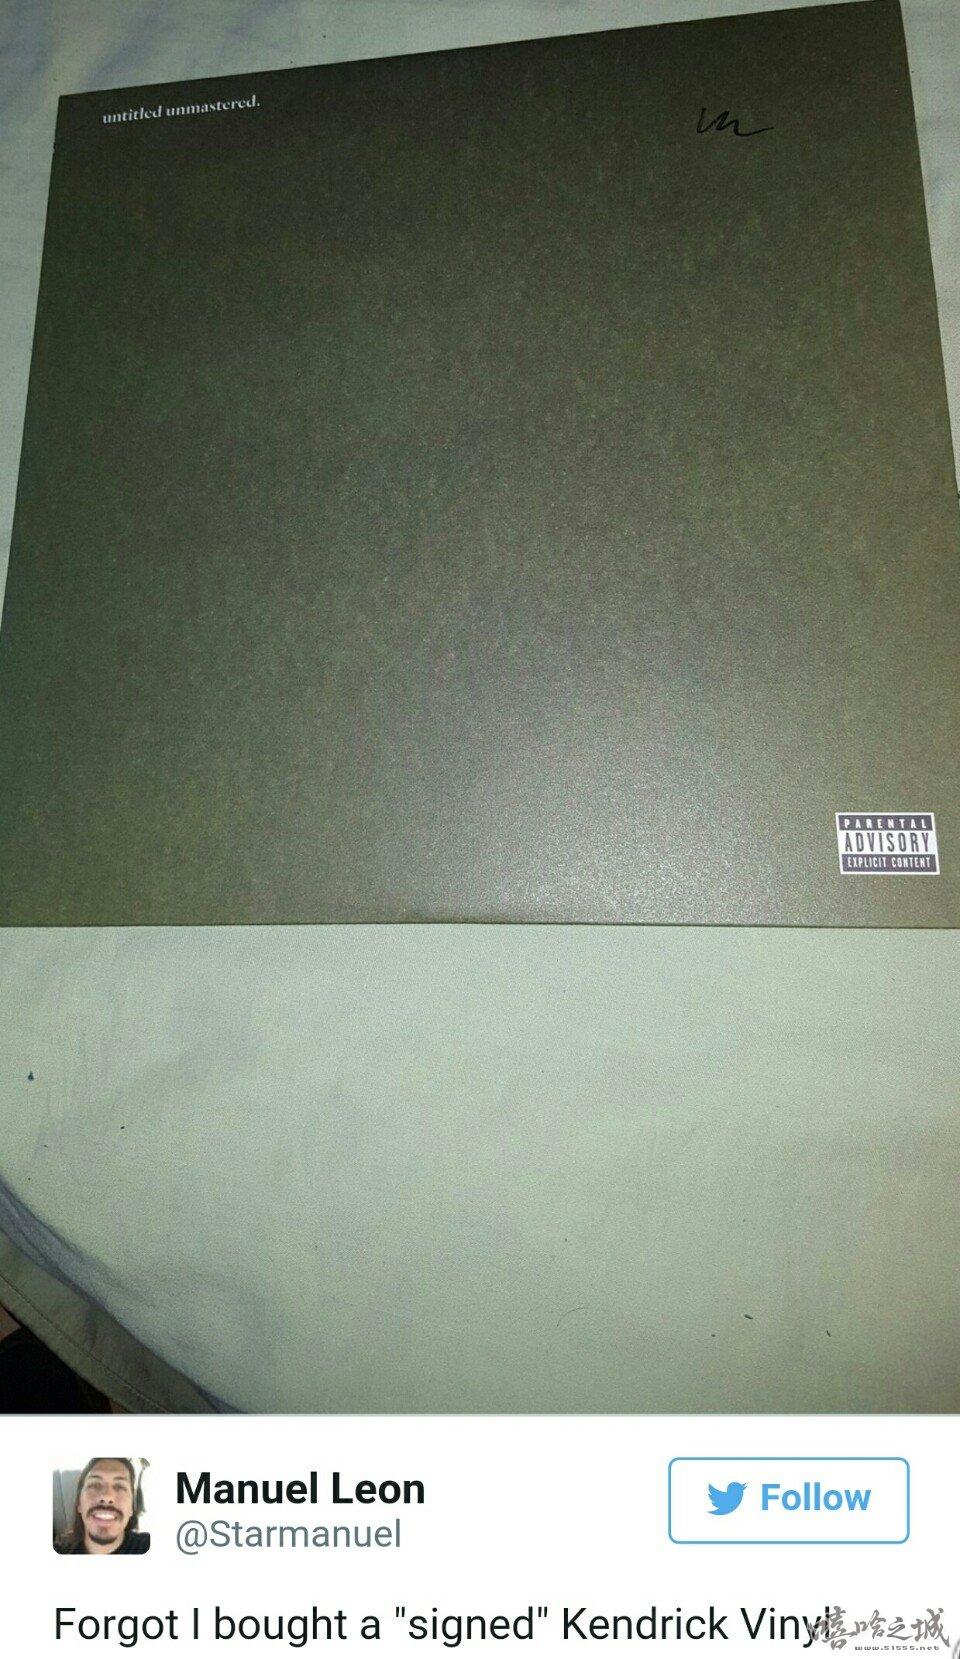 Kendrick Lamar发售黑胶版本专辑被吐槽签名草率